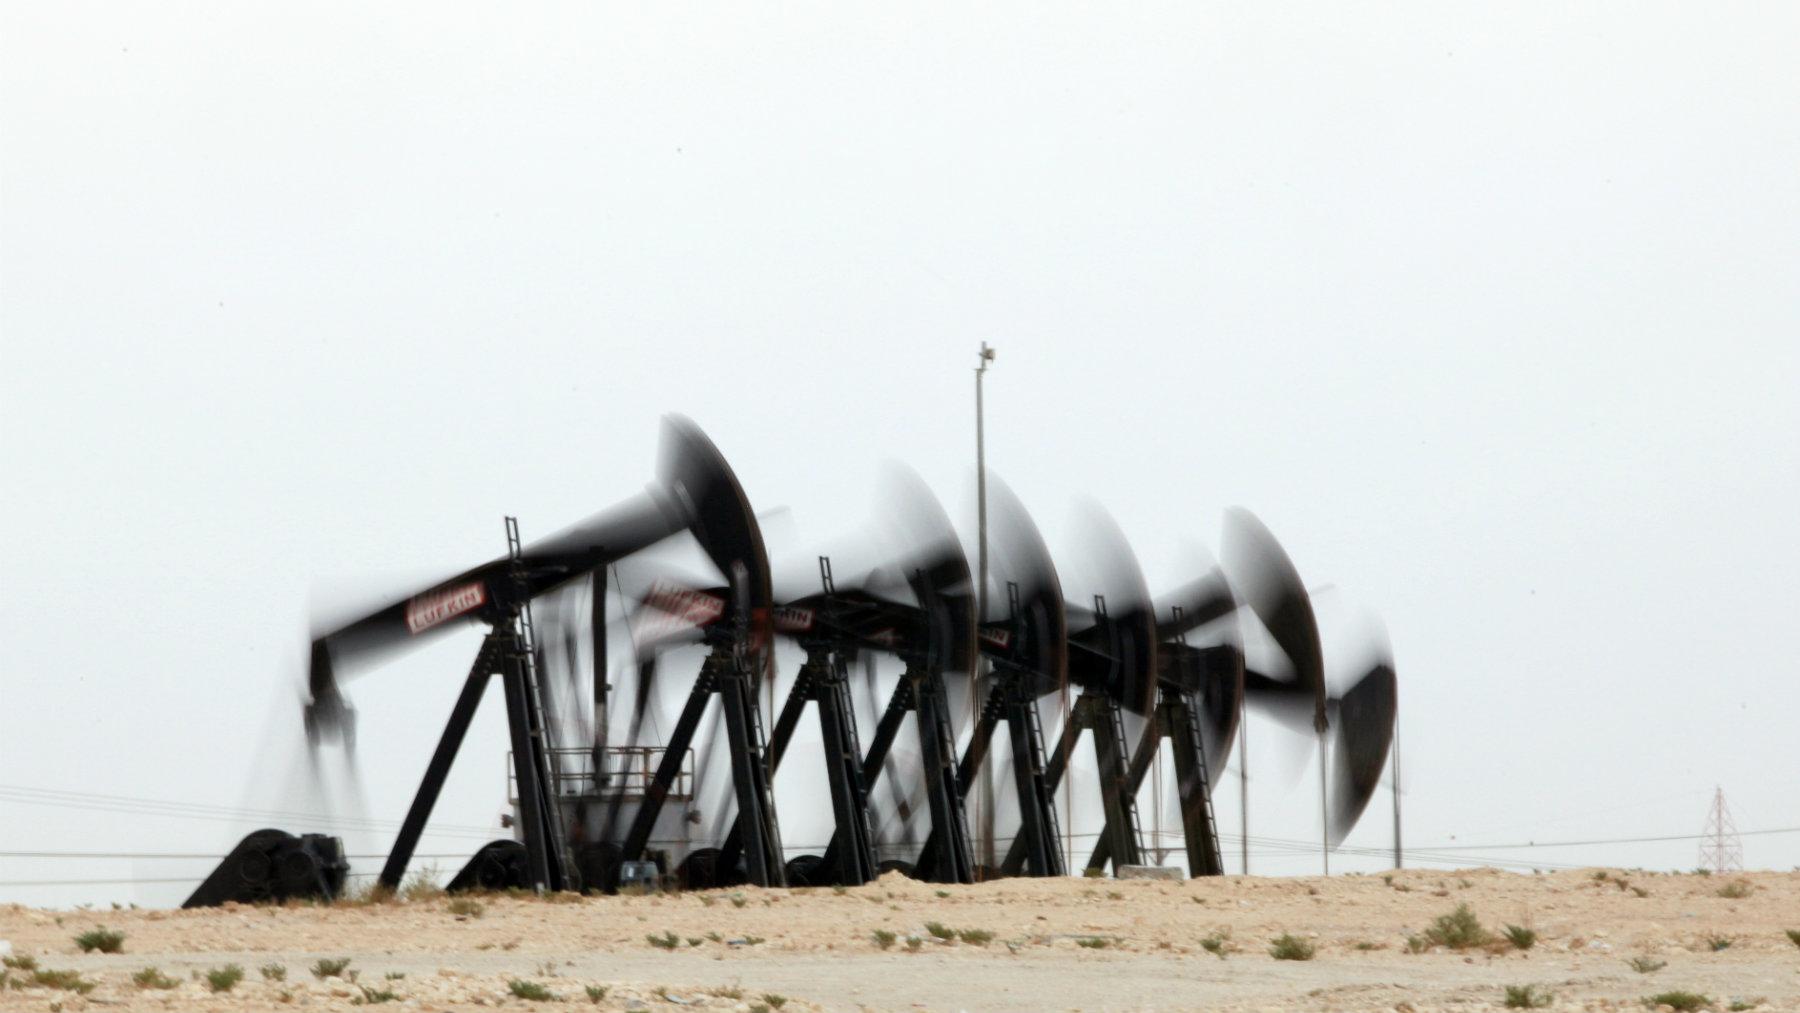 A row of oil pumps work in the desert oil fields of Sakhir, Bahrain.